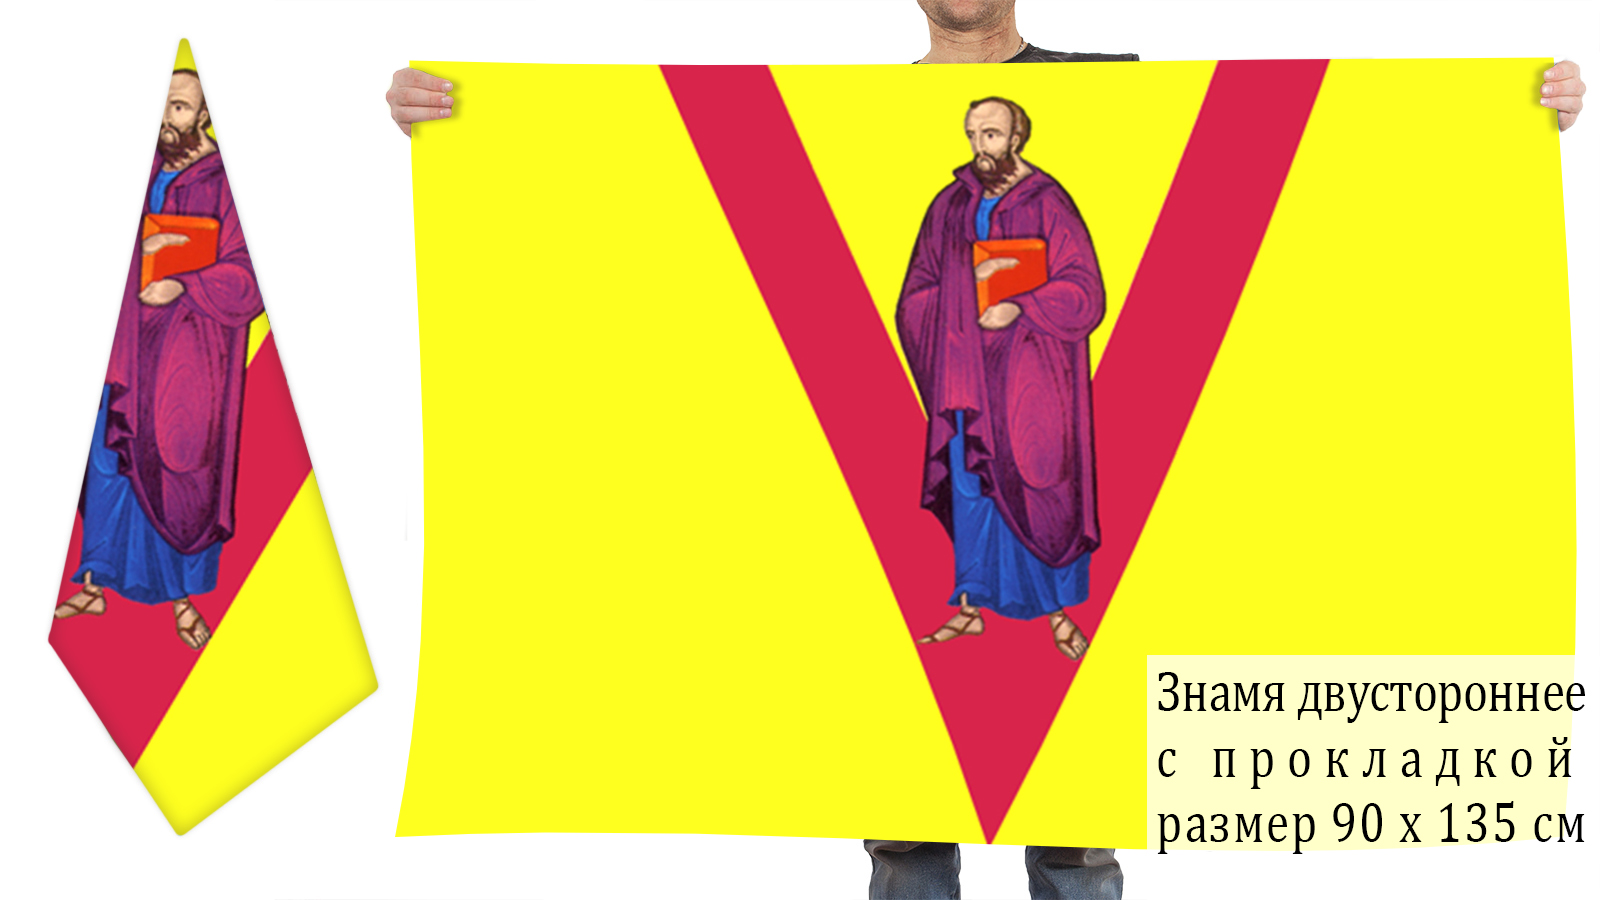 Двусторонний флаг Павловского района Краснодарского края